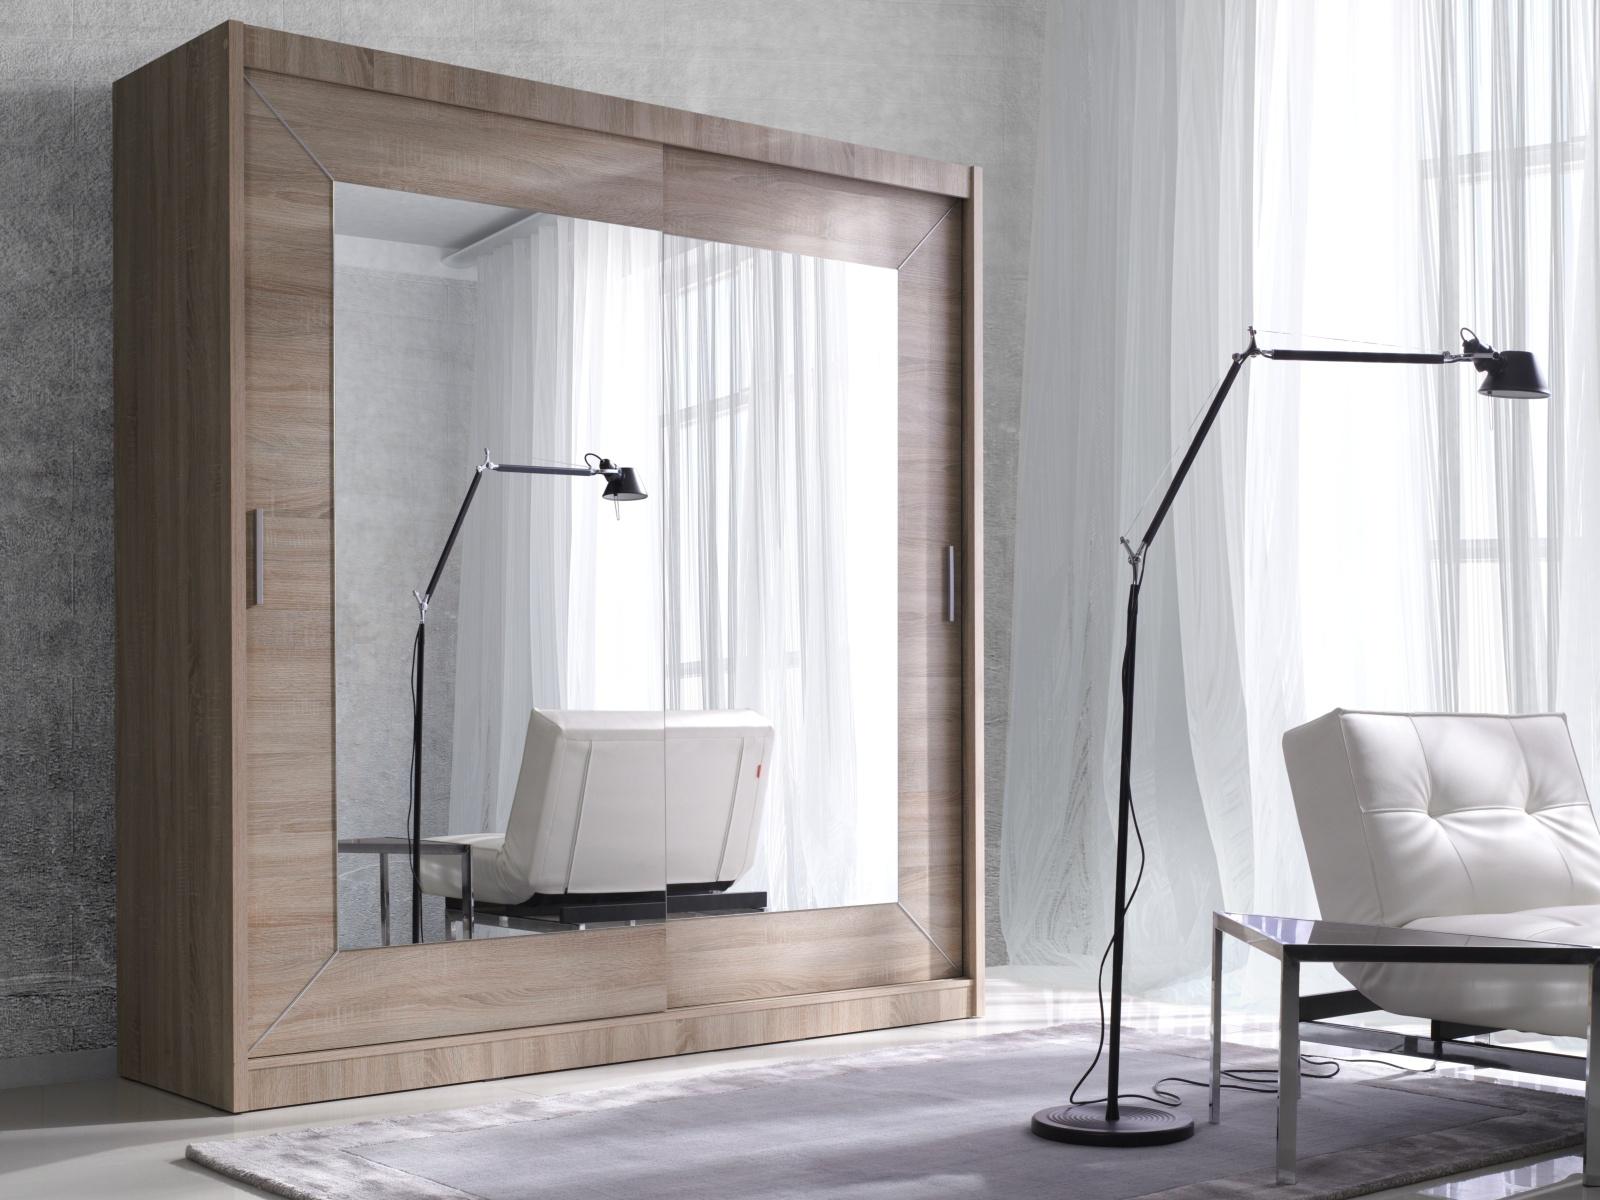 Smartshop ALFA šatní skříň se zrcadlem 150 TYP 16, dub sonoma světlý